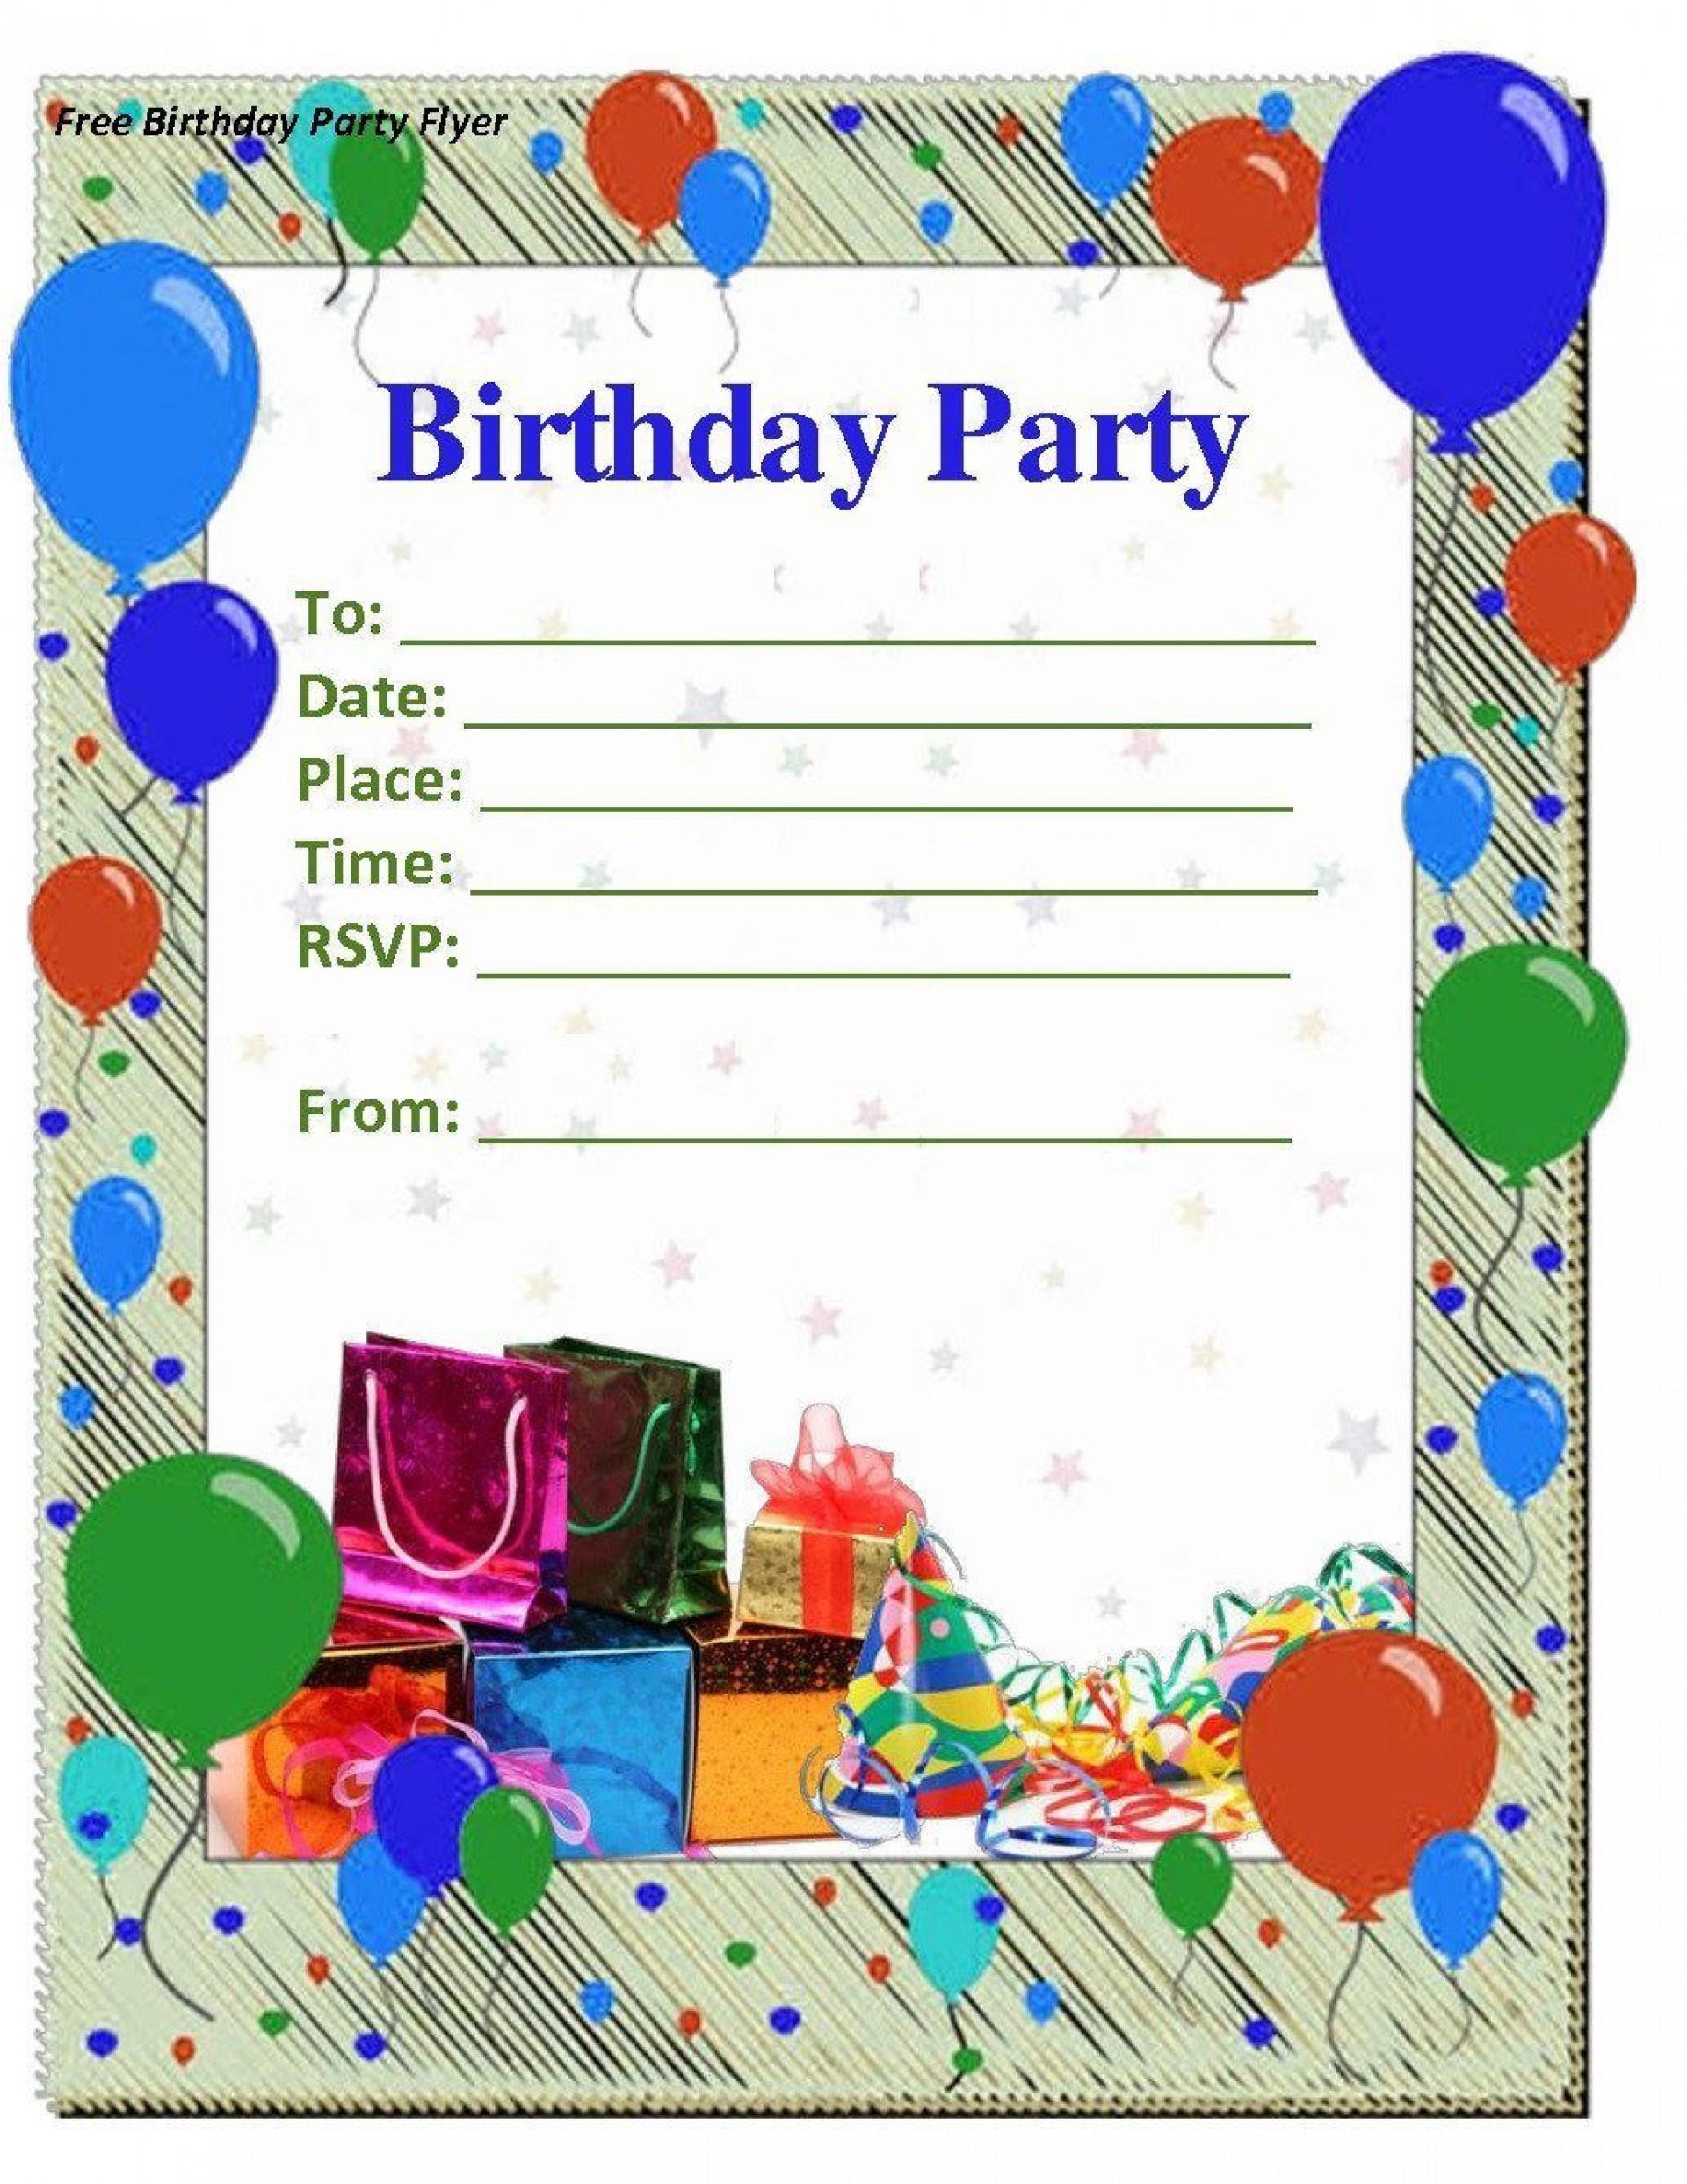 008 Amazing Microsoft Word Birthday Invitation Template Idea  Editable 50th 60th1920